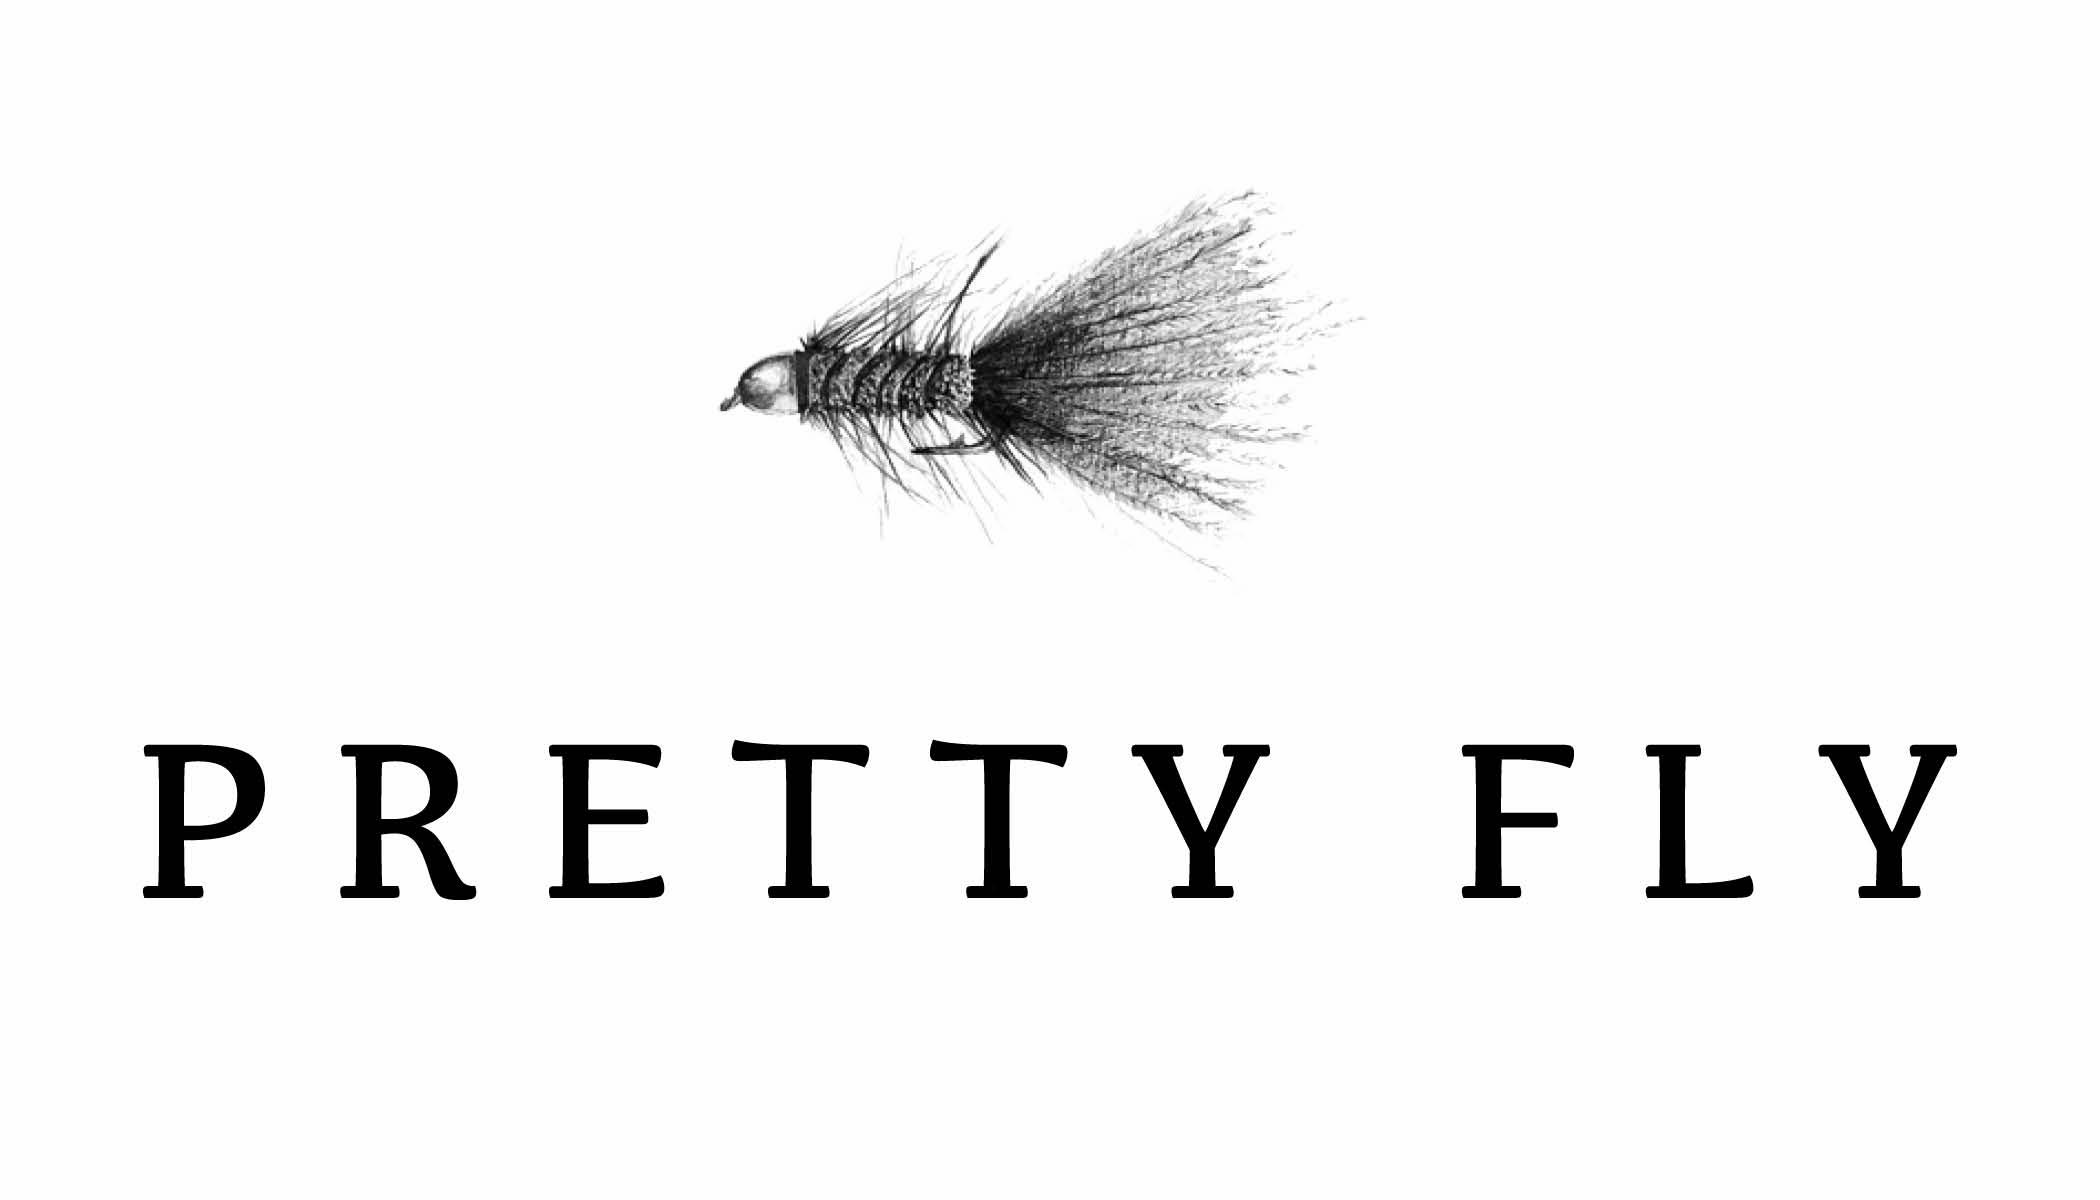 PrettyFly_TM.jpg